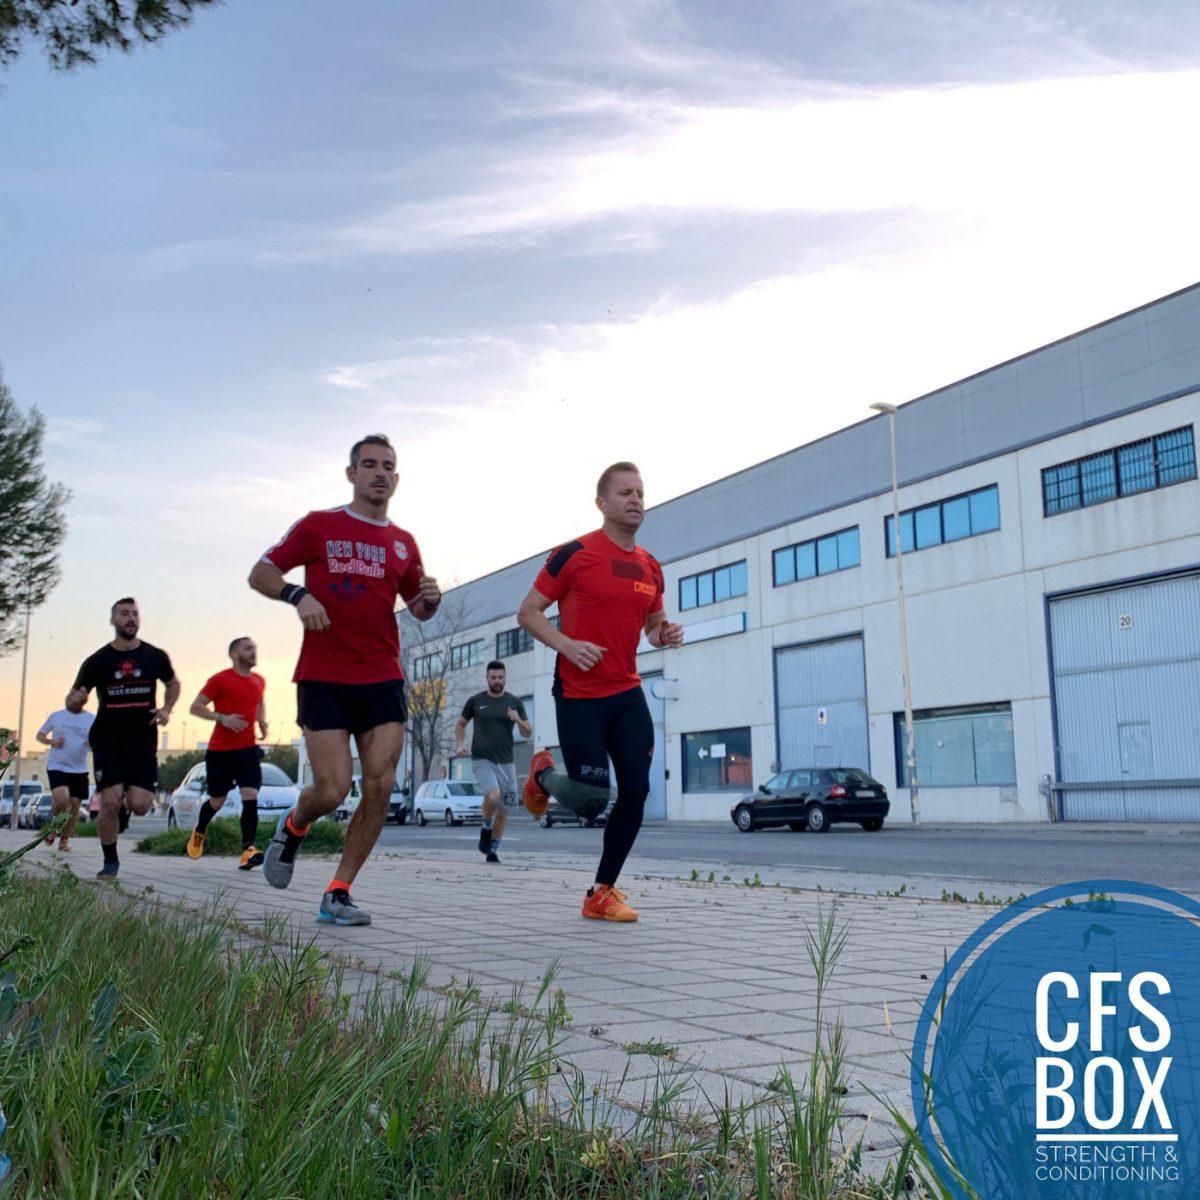 Wod CFS Box CrossFit Sevilla training lions running